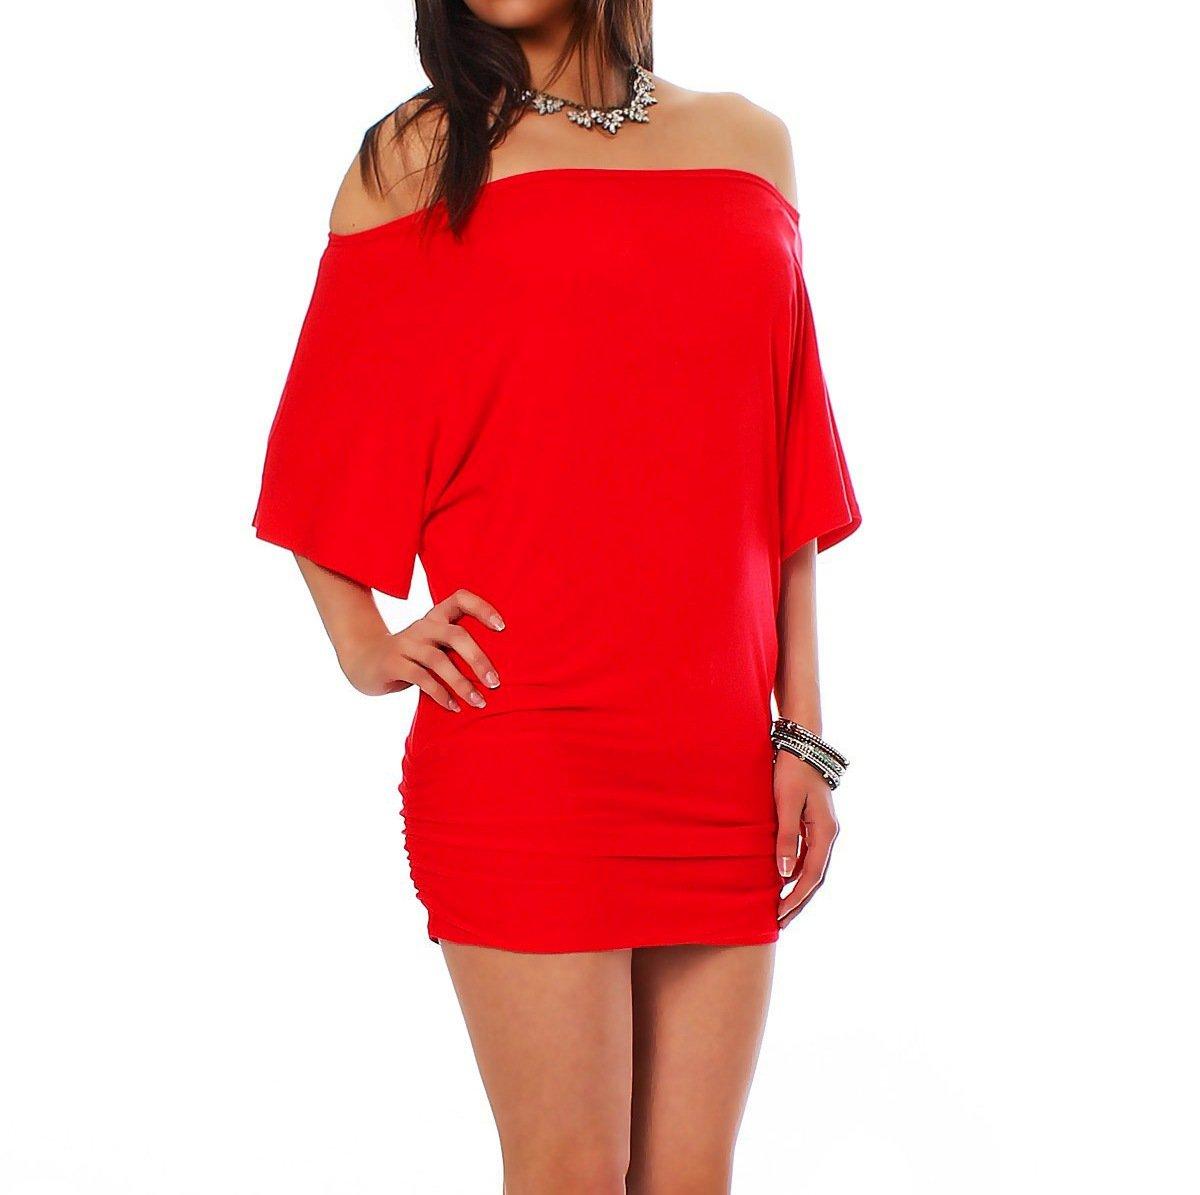 Mississhop Damen Shirt Bluse Sommer Sommershirt Carmenbluse Longshirt Tunika Bluse Pullover T-Shirt Tank Top Minikleid